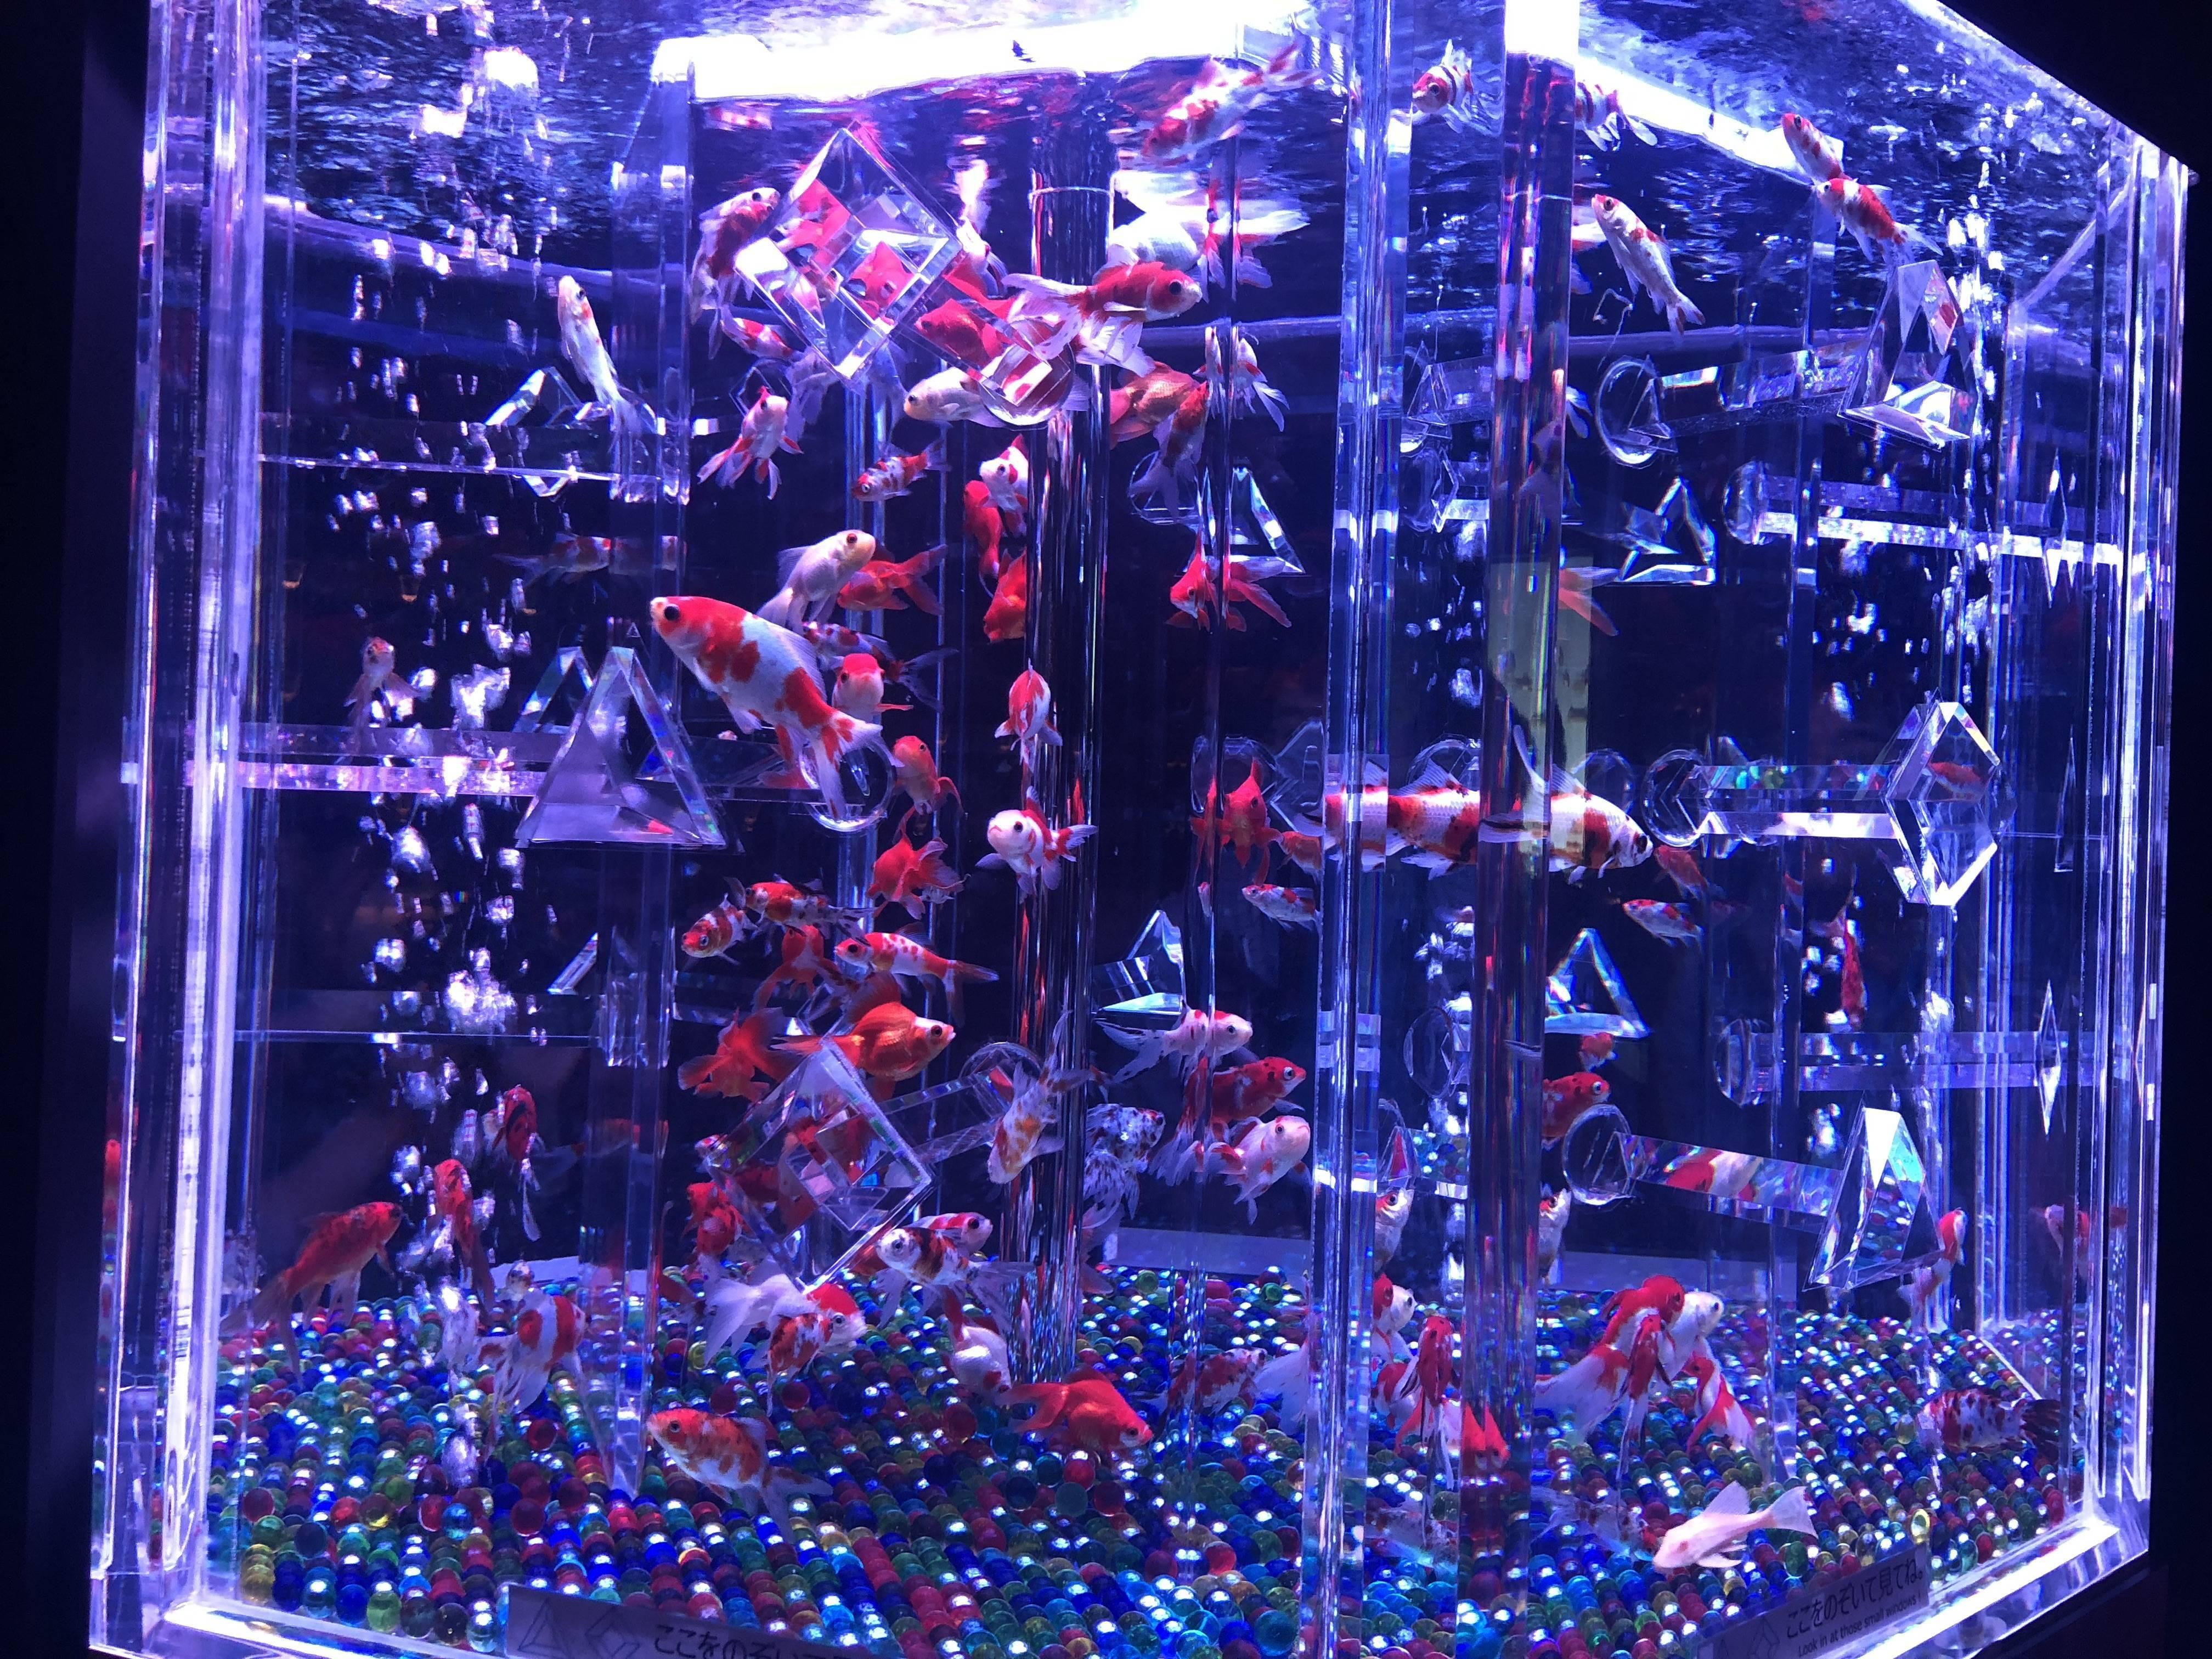 Vol.59♡ 9/24まで!8000匹の金魚がとてもフォトジェニック!【日本橋アートアクアリウム2018】_1_5